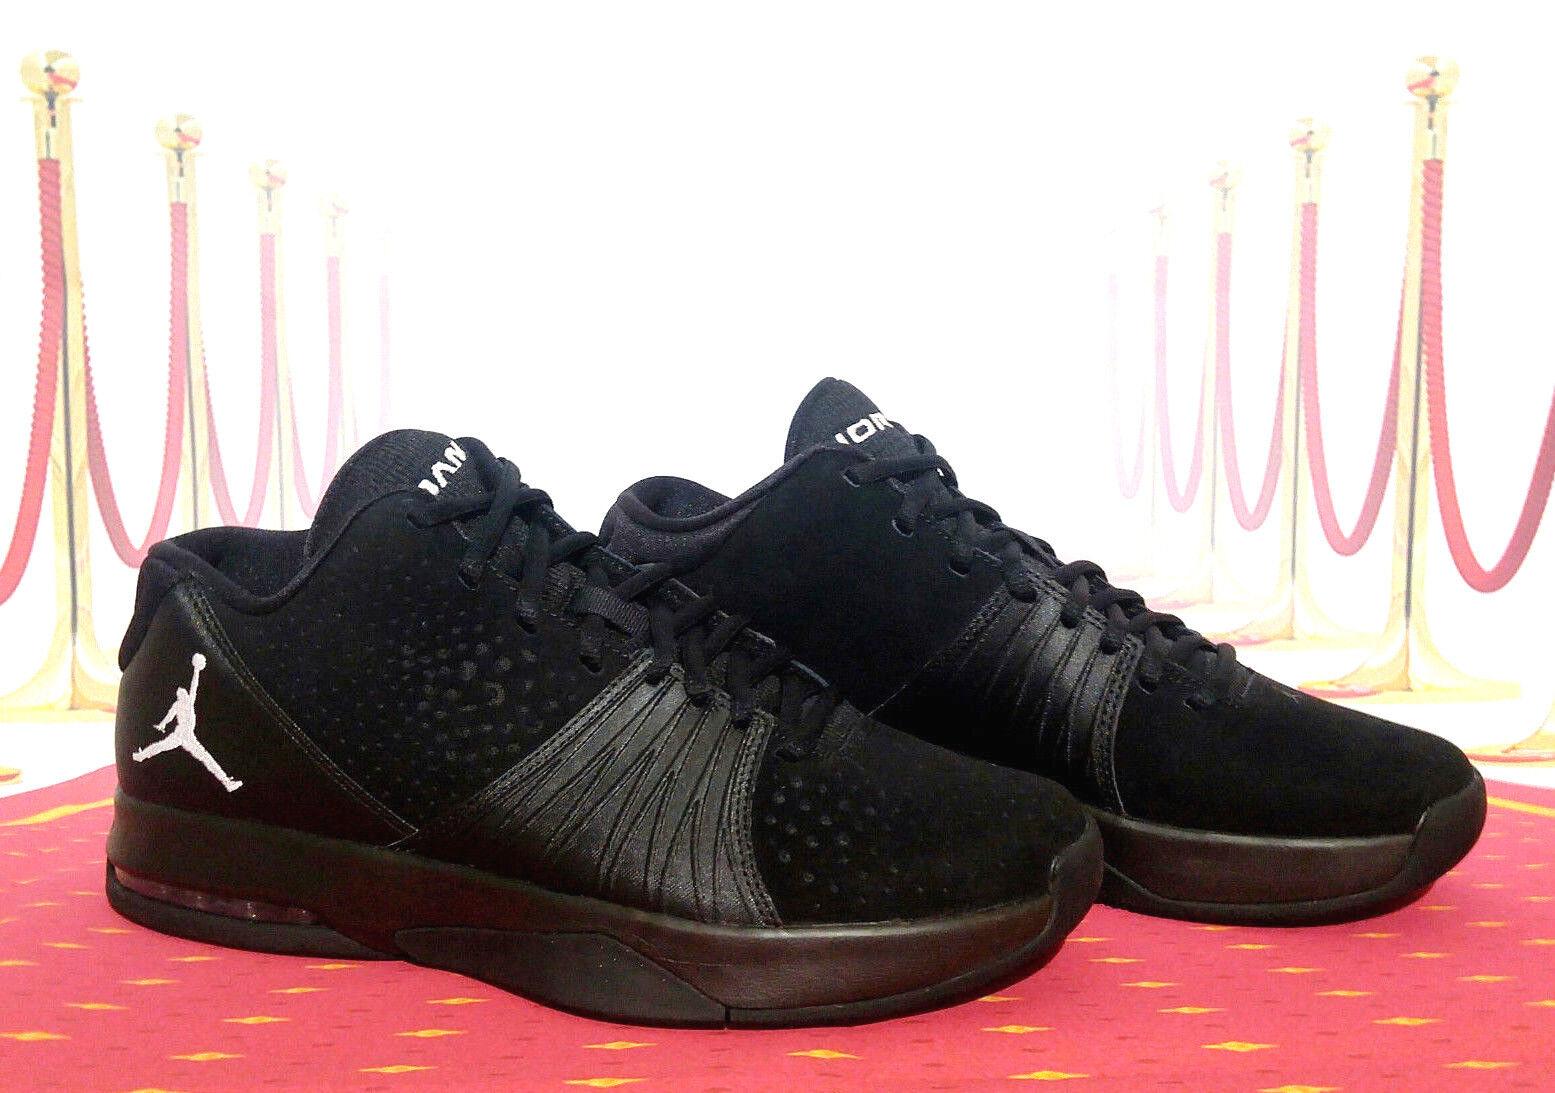 Nike jordan 5 bin 807546 010 männer - schuhe in allen größen neue triple schwarz